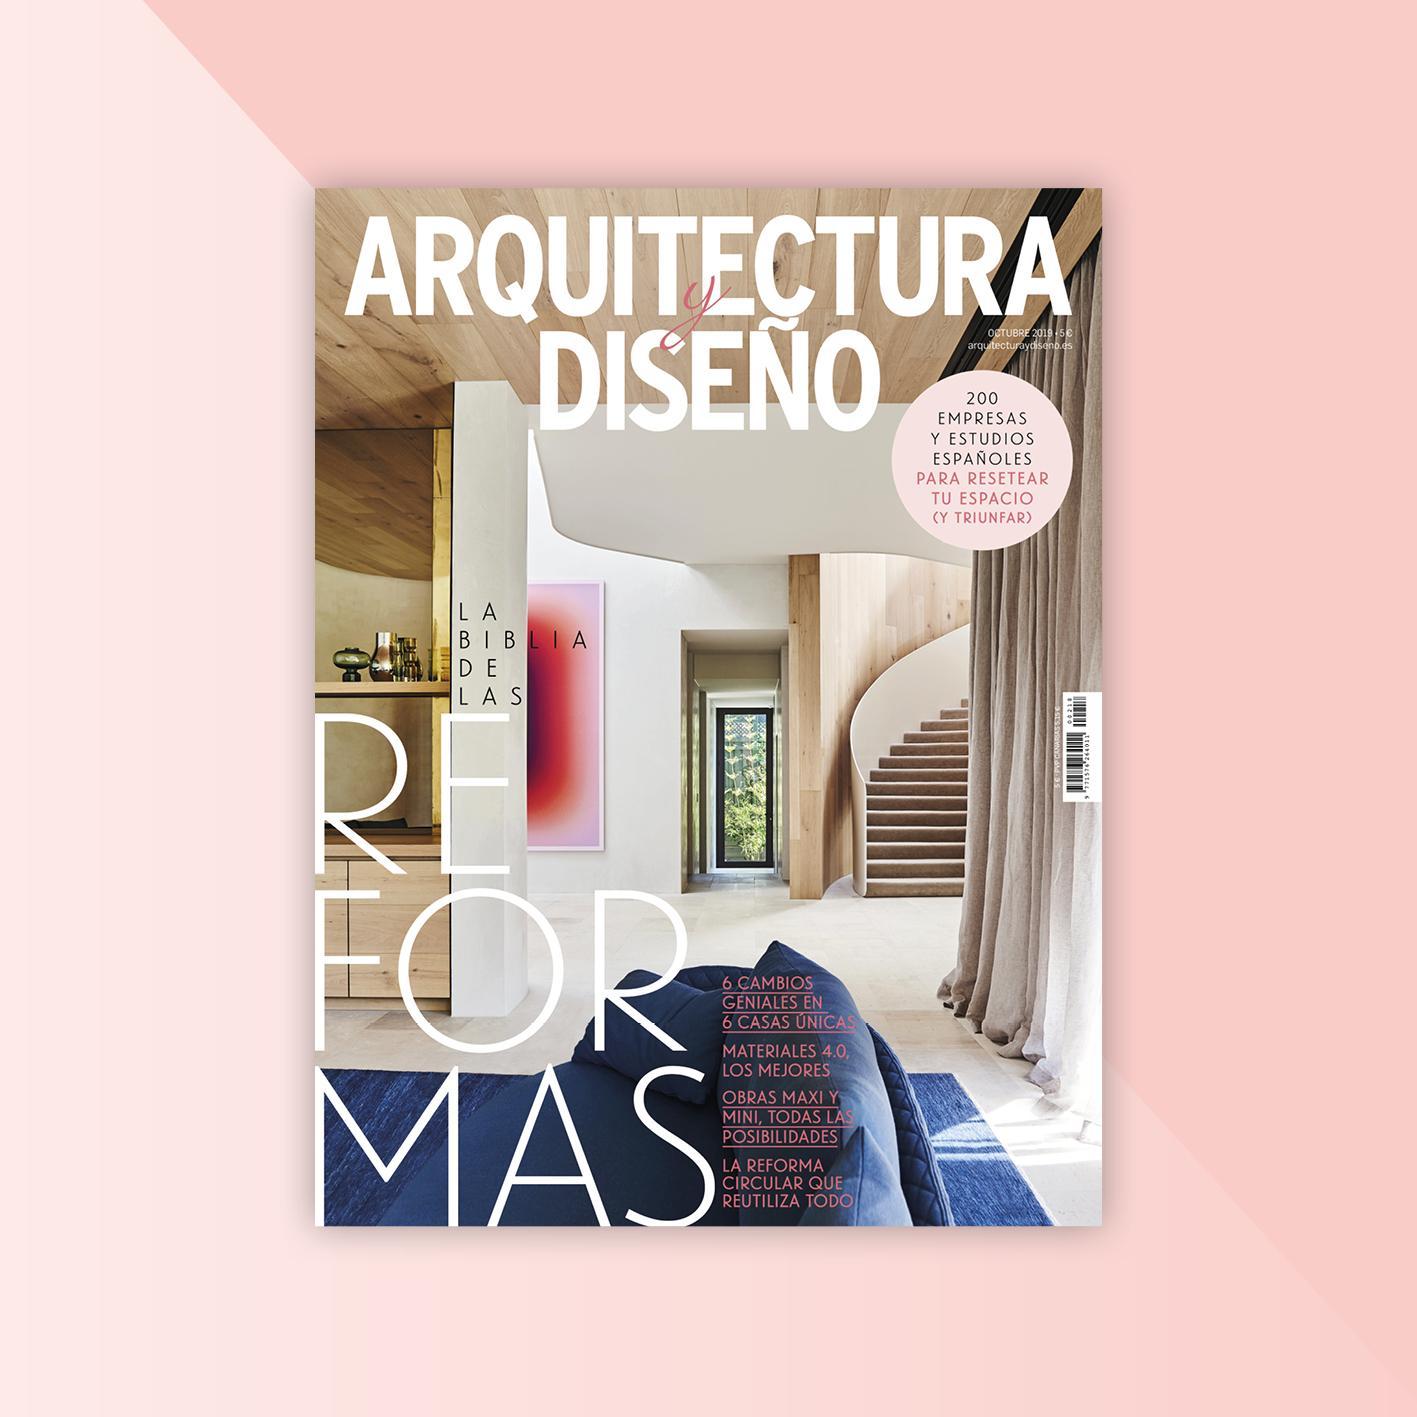 Avatar - Arquitectura y Diseño